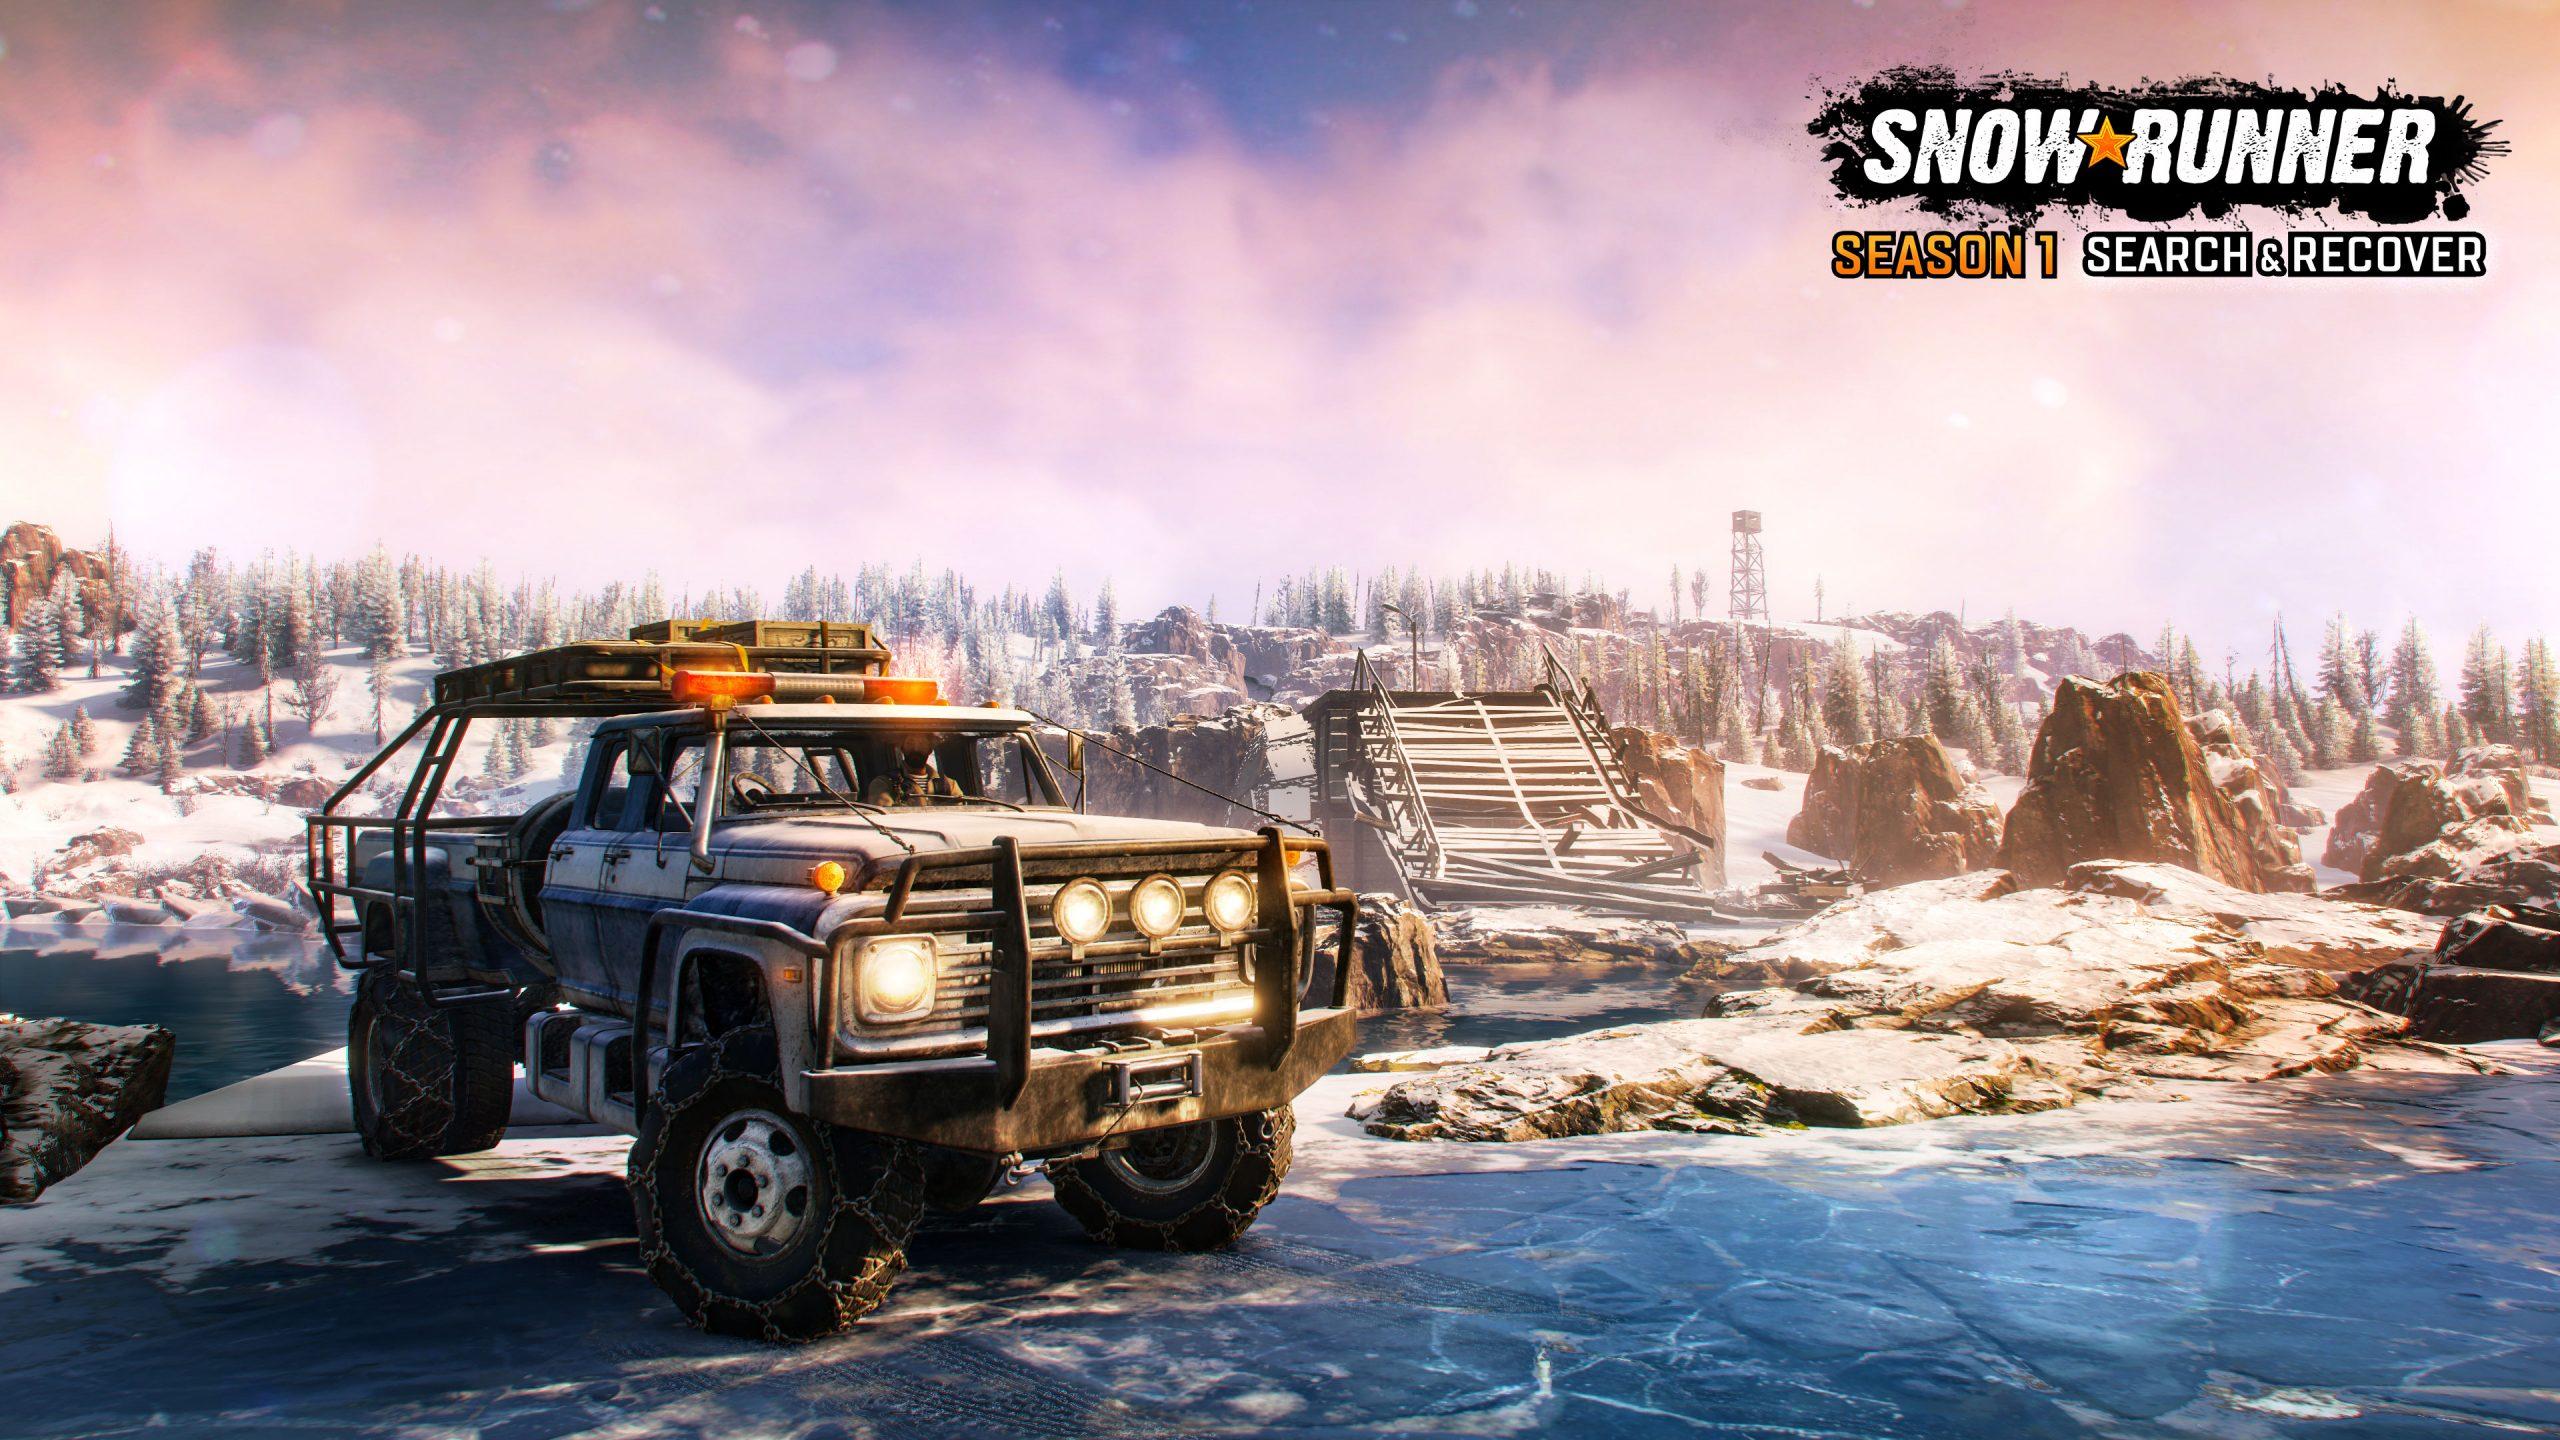 SnowRunner Season1 screenshot logo 05 scaled - SnowRunner Gets Its First Big DLC Next Week